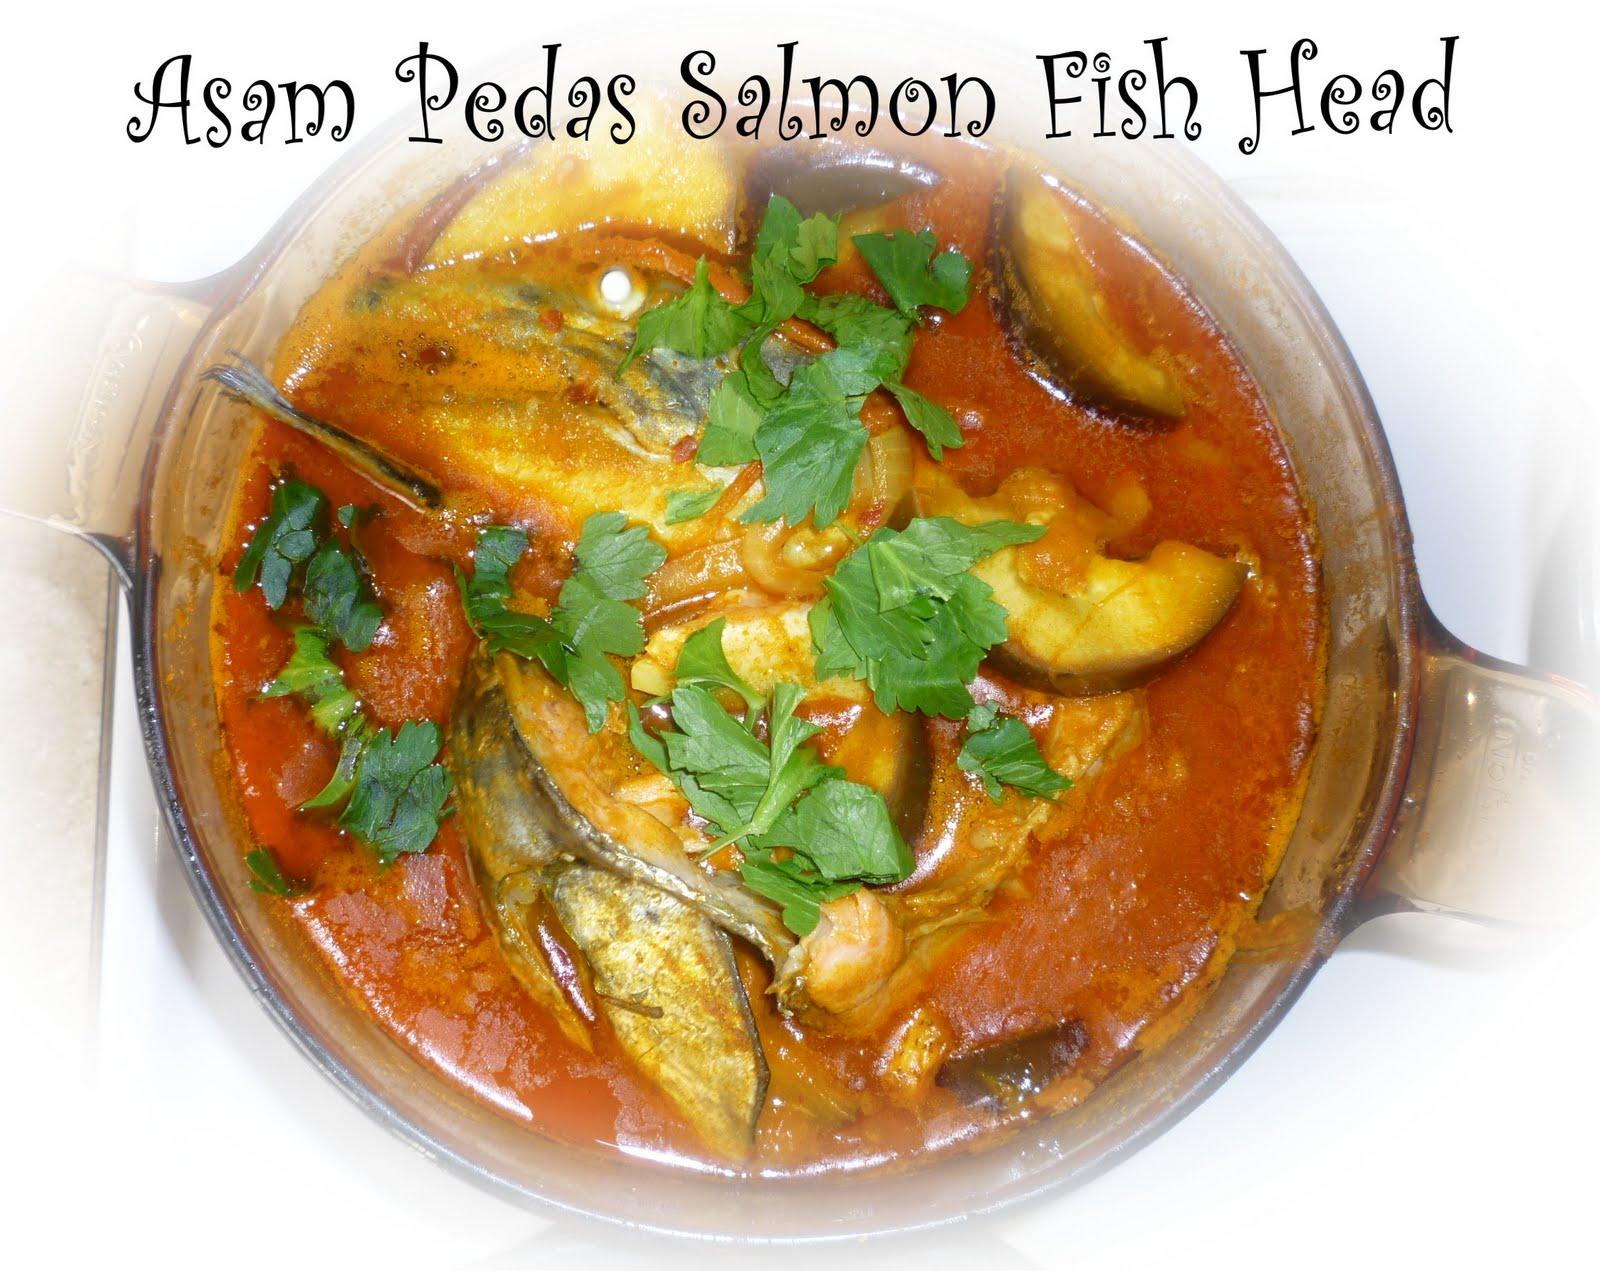 Yin 39 s homemade assam pedas salmon fish head for Fish head recipe